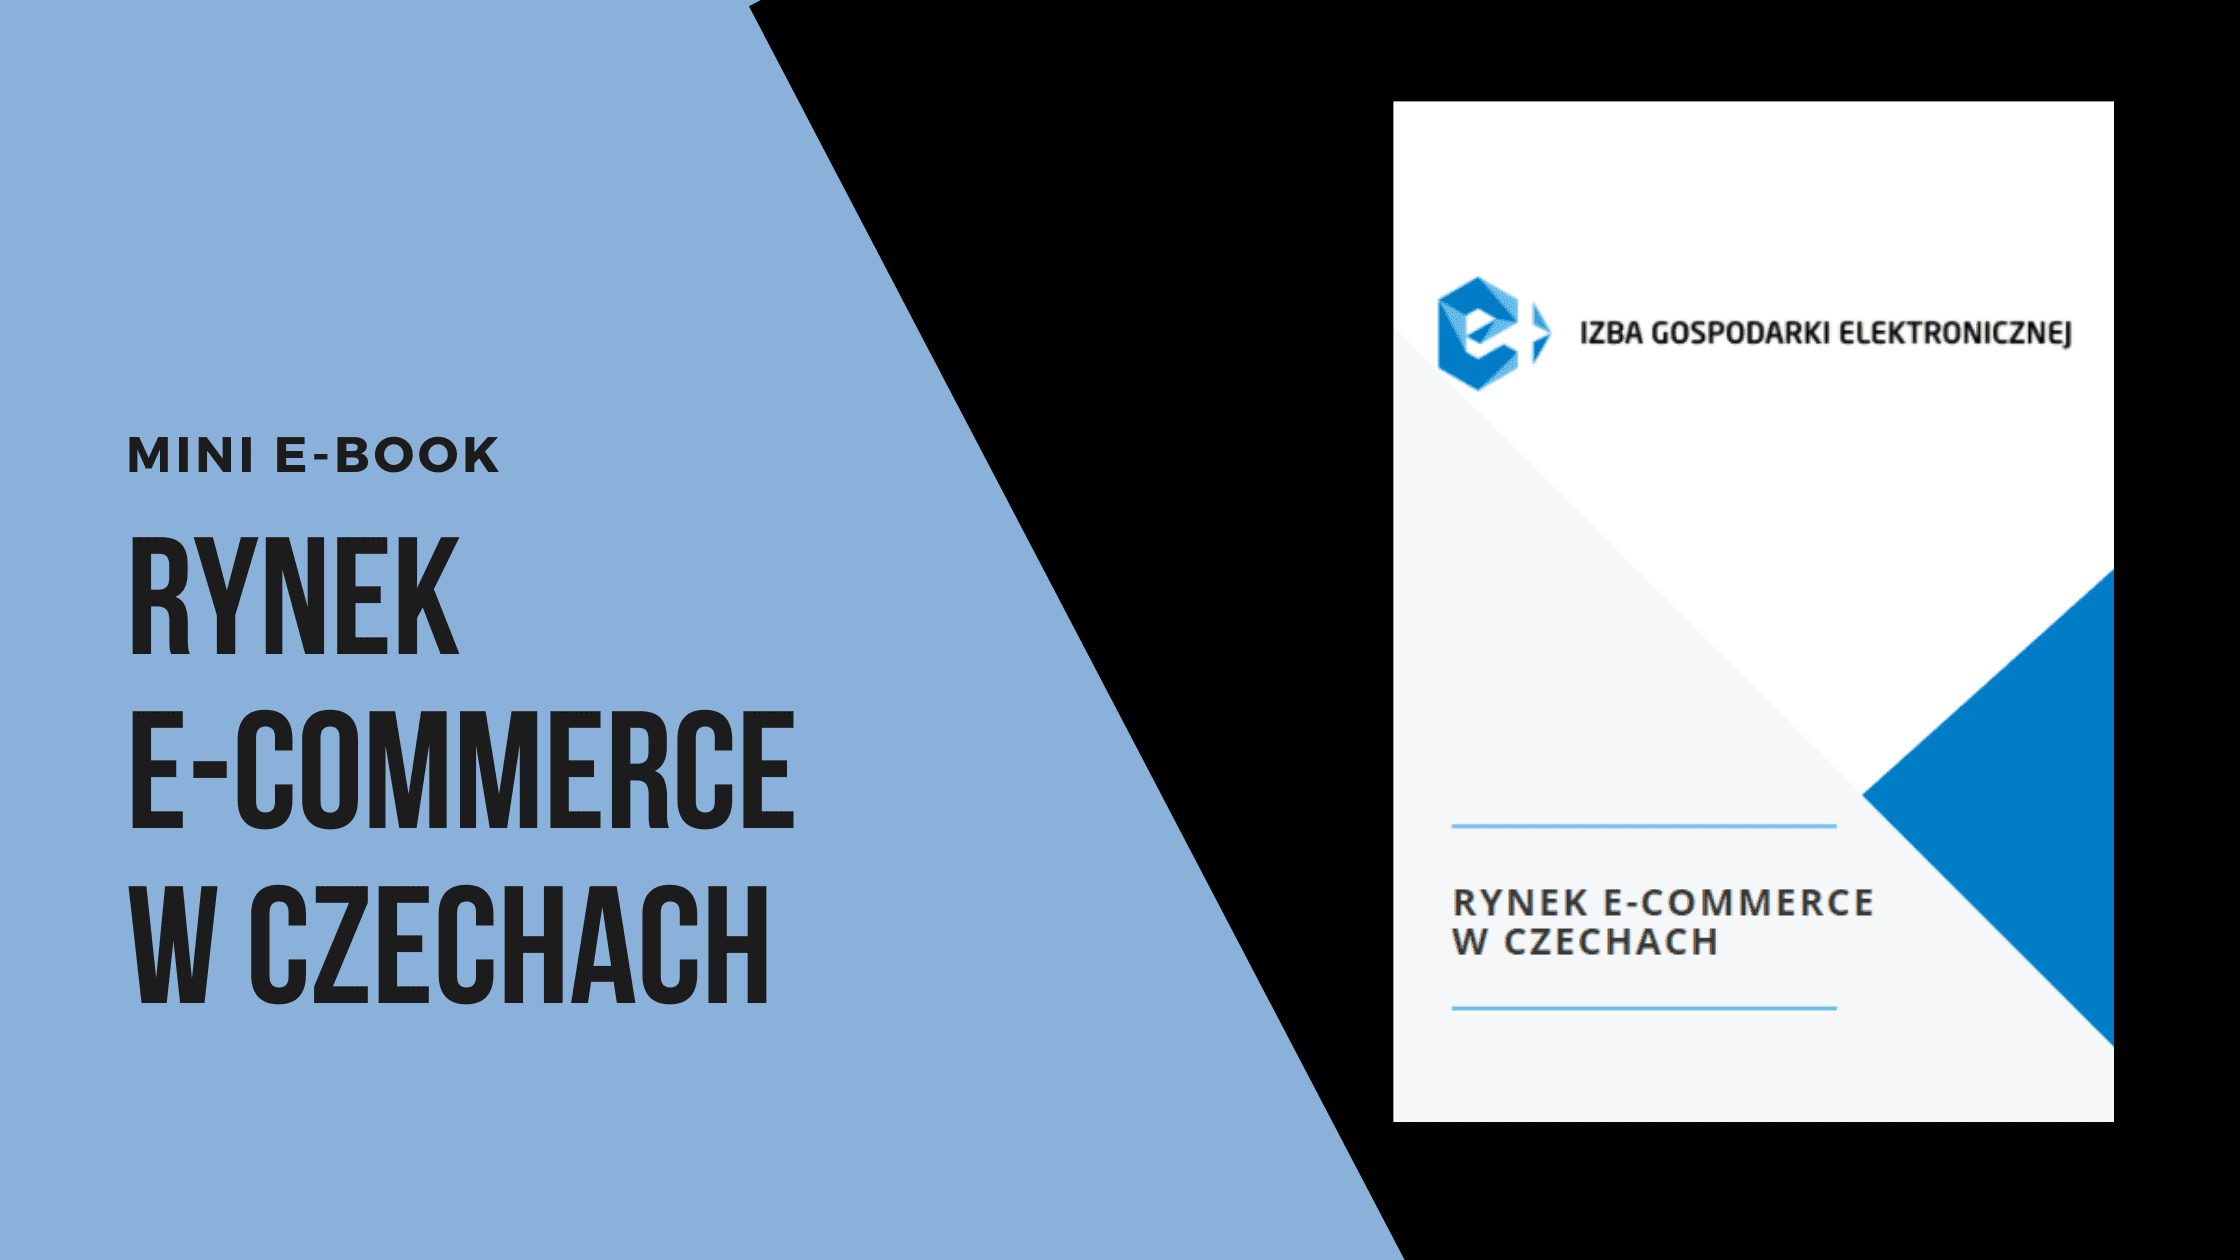 Rynek e-commerce w Czechach